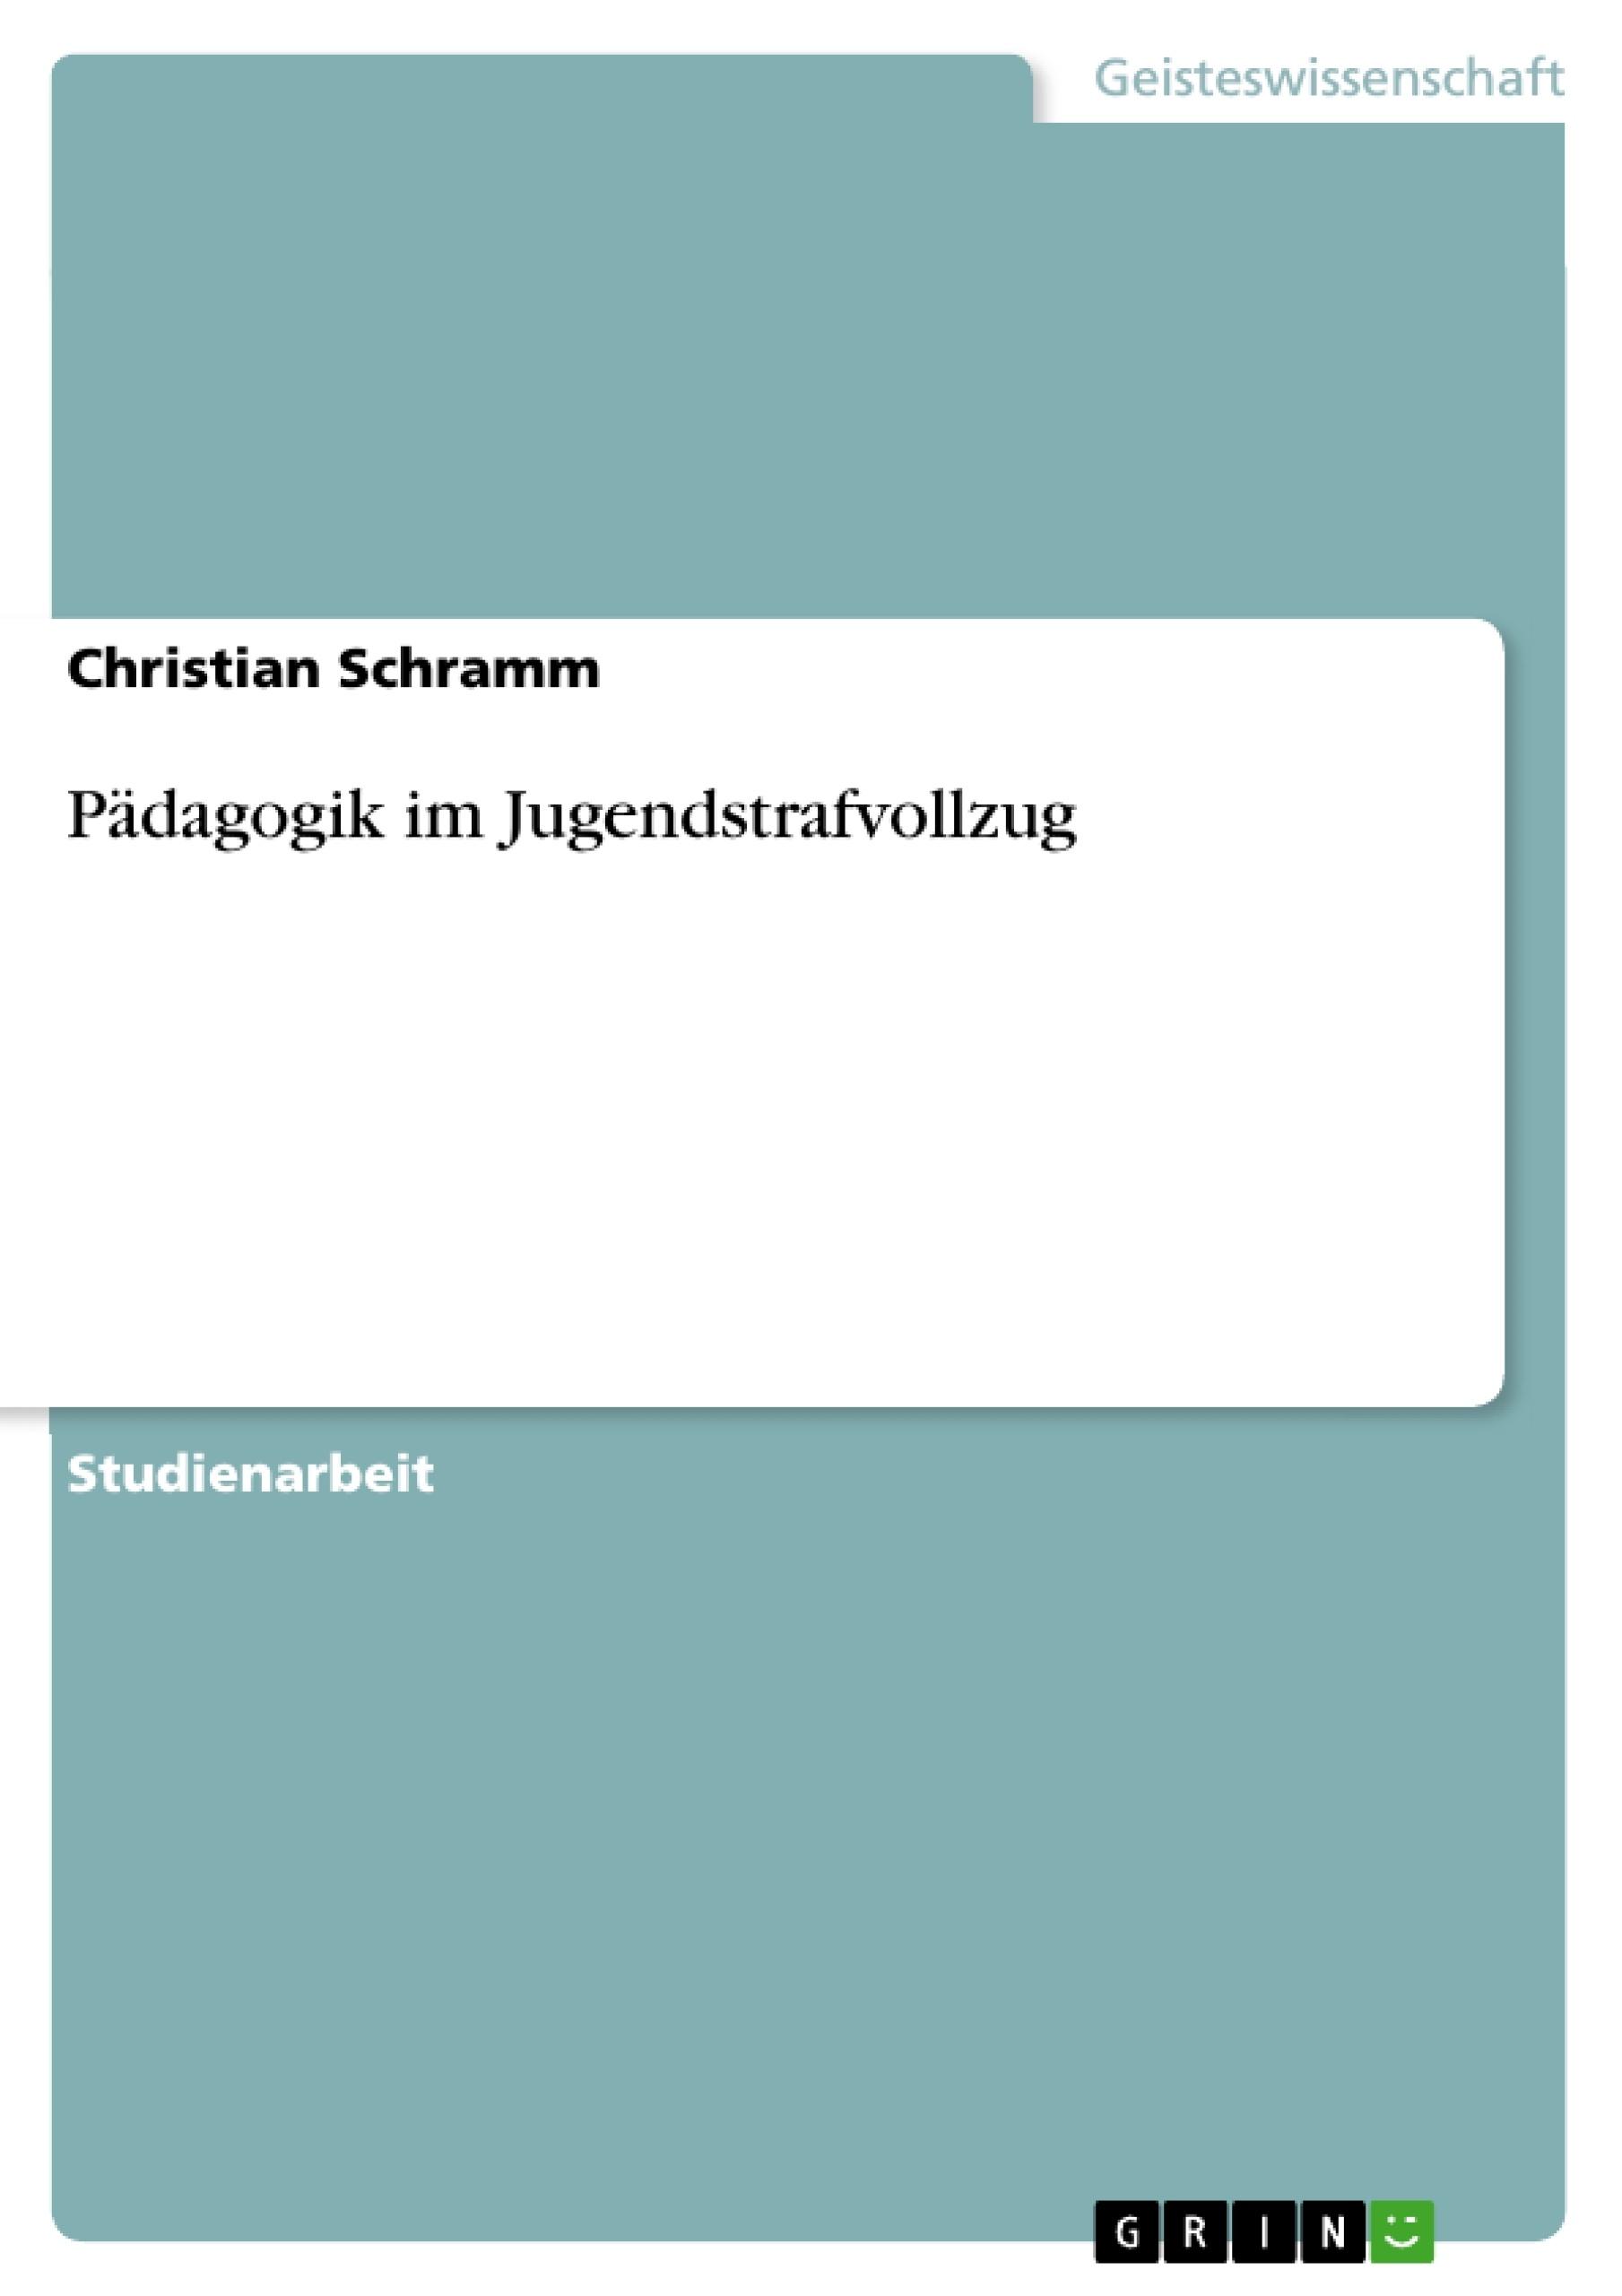 Titel: Pädagogik im Jugendstrafvollzug